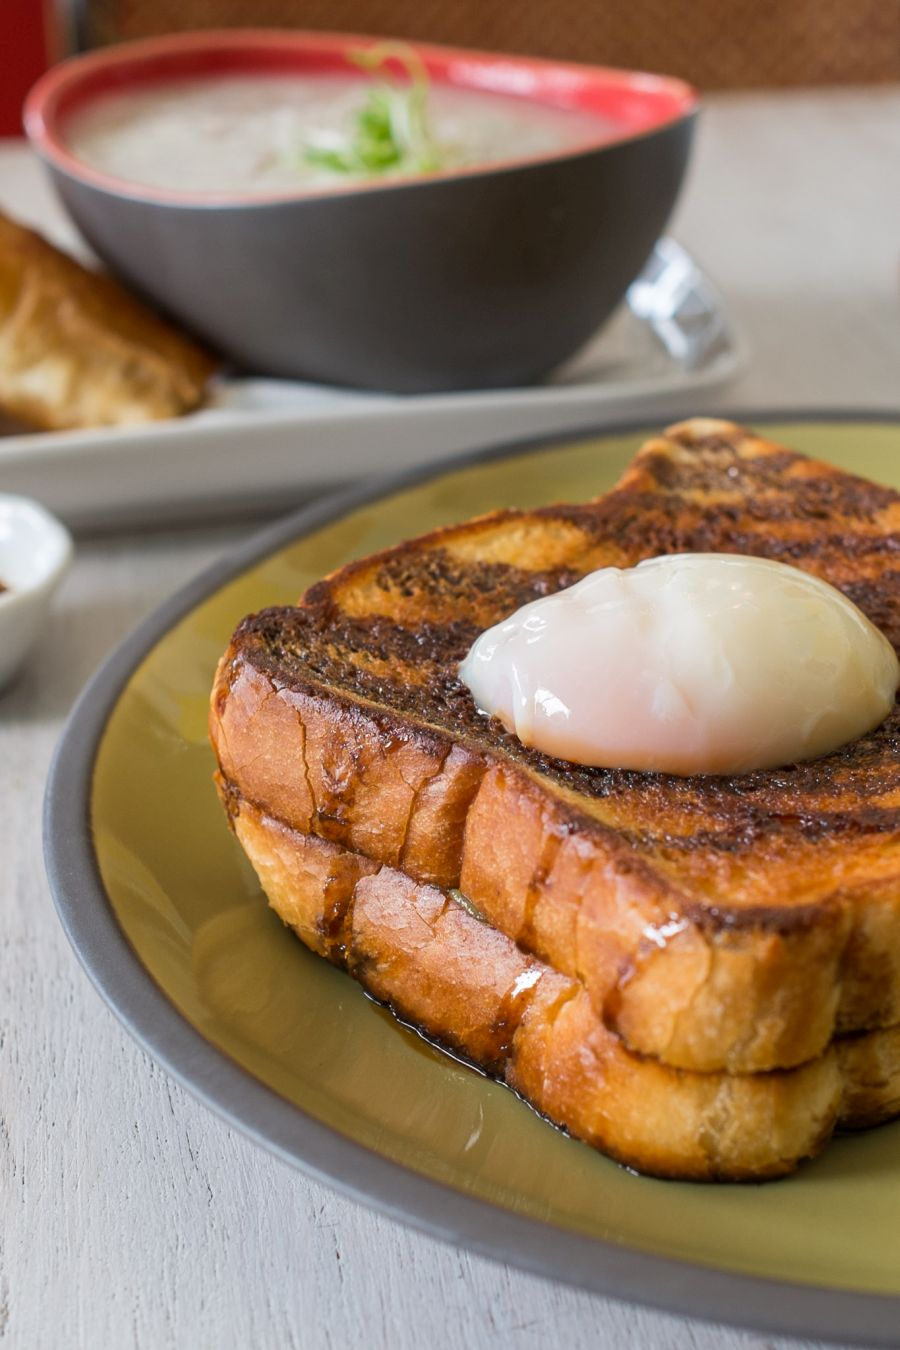 Kaya toast - Texas toast, pandan kaya, 62C egg, sweet soy (AU$12)